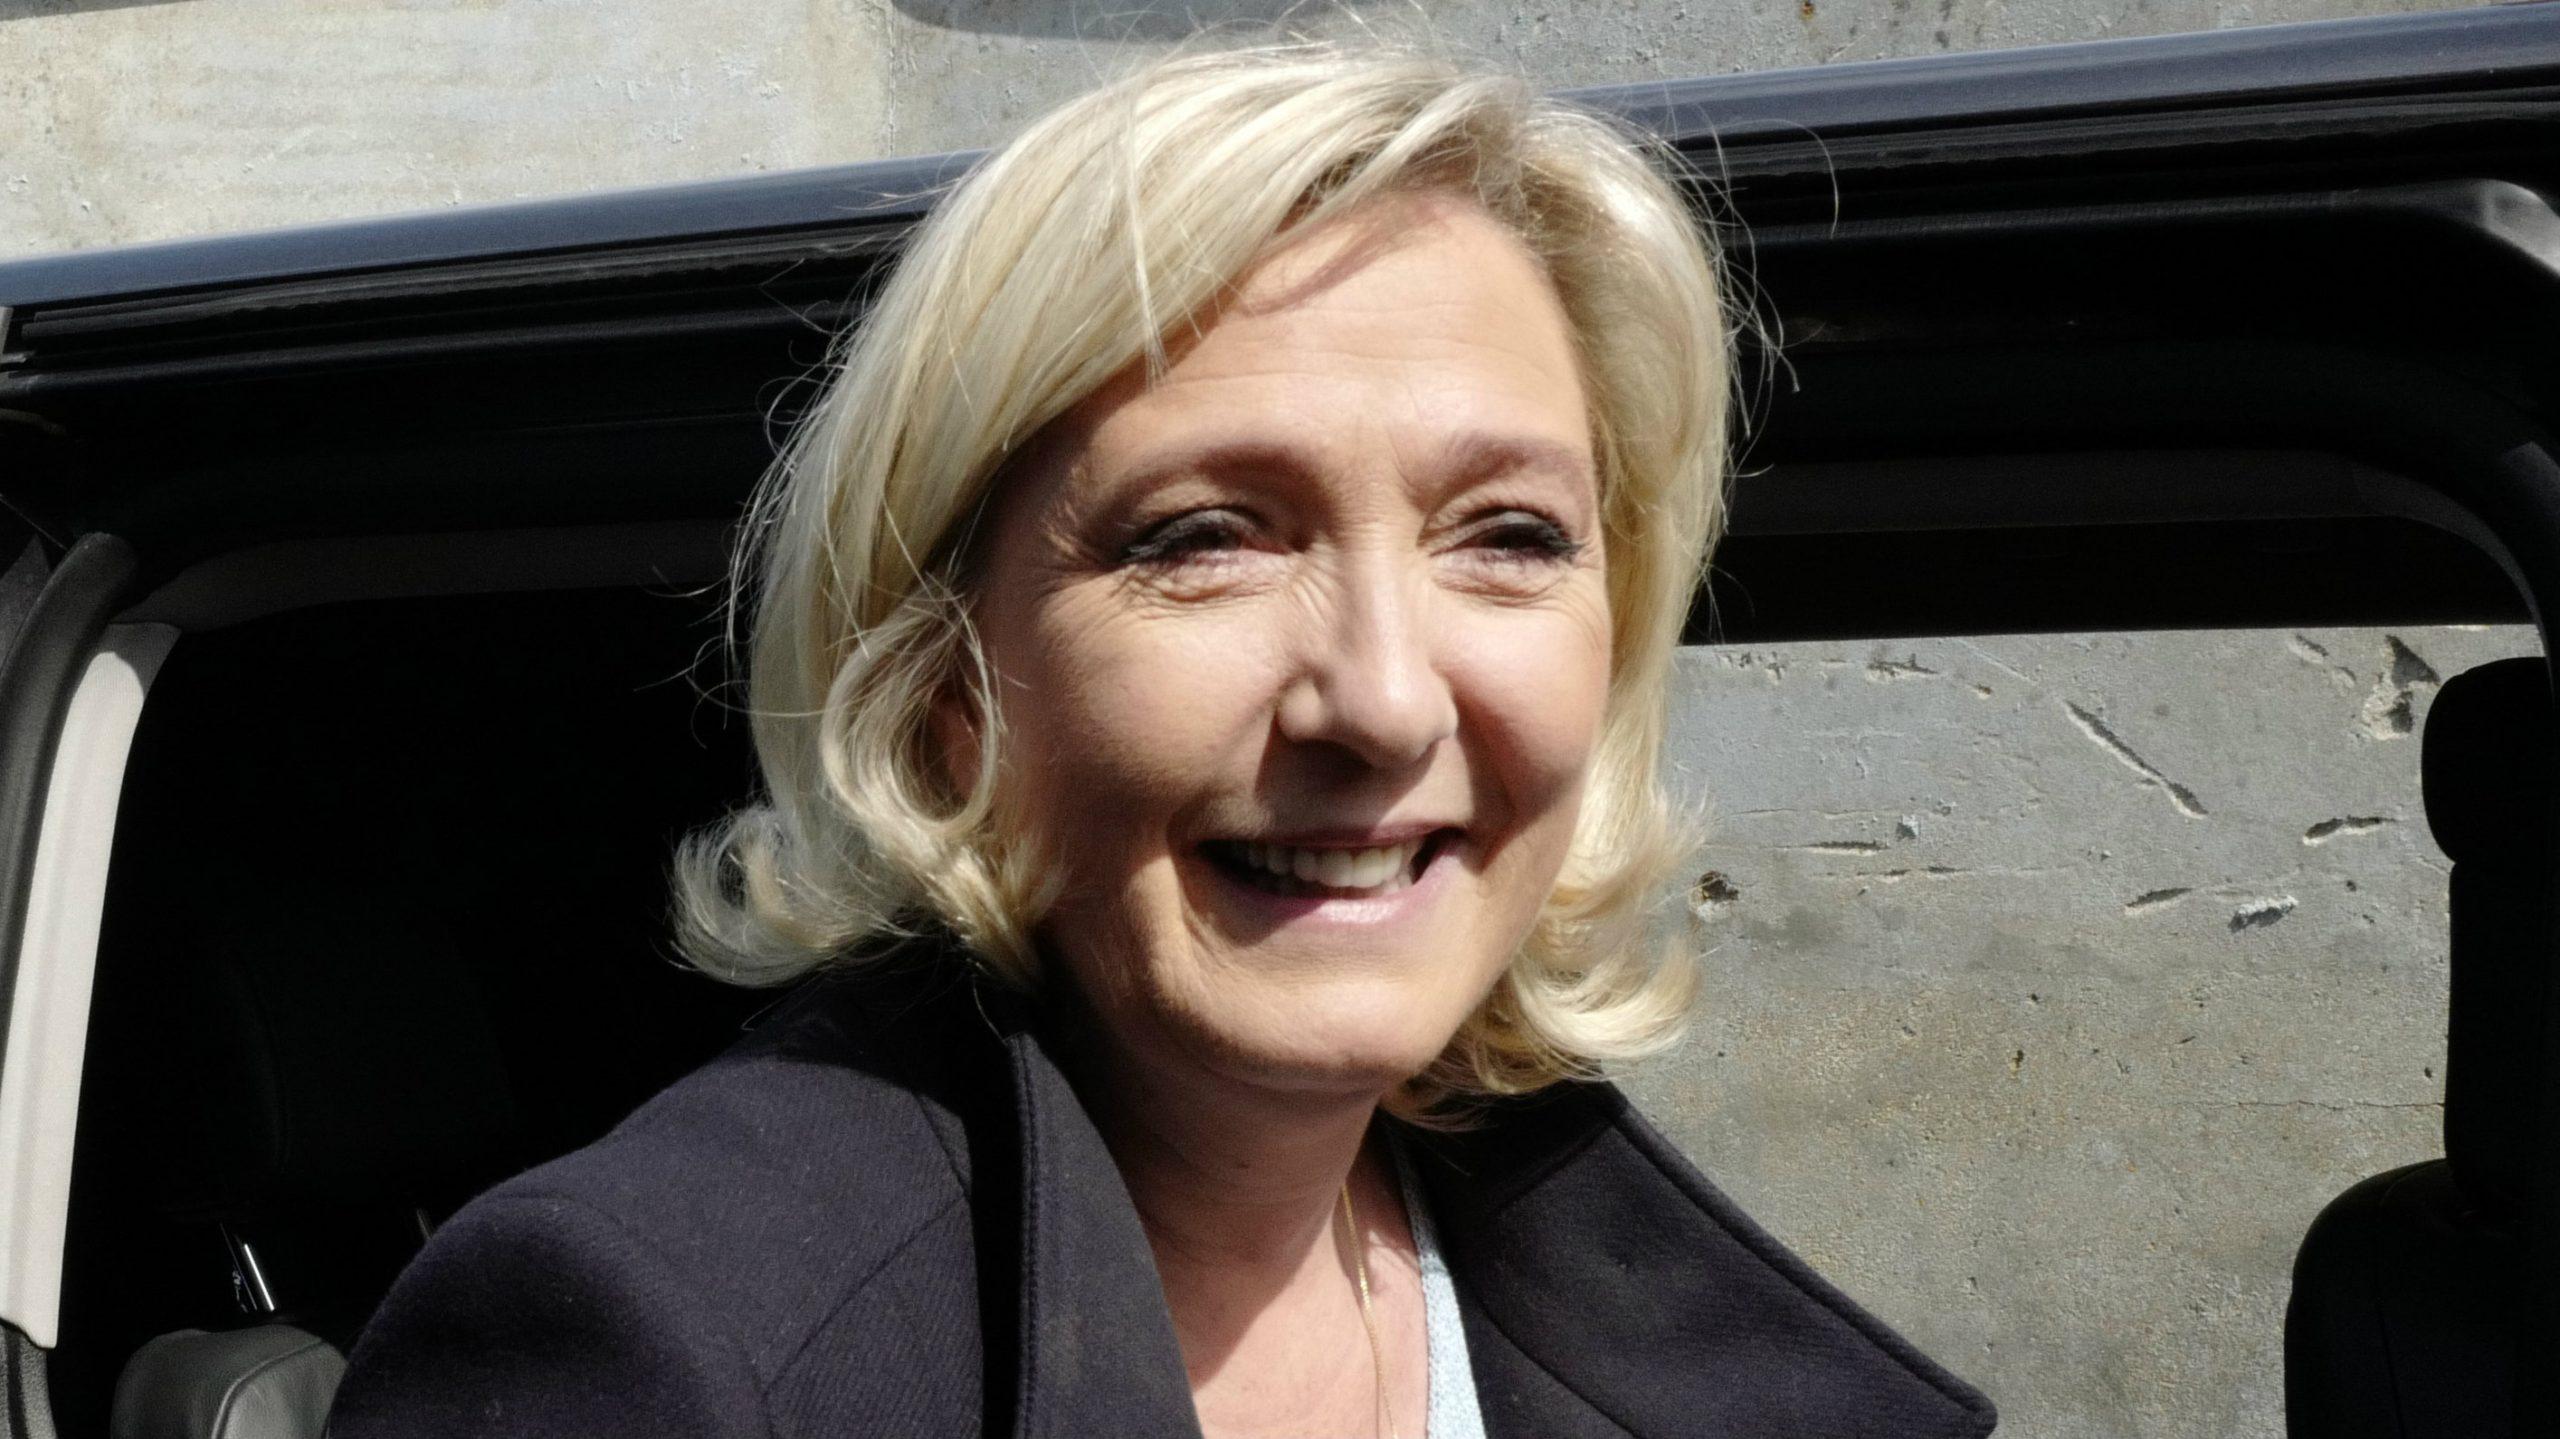 Marin Le Pen: Bregzit je zastrašujući neuspeh za EU 1